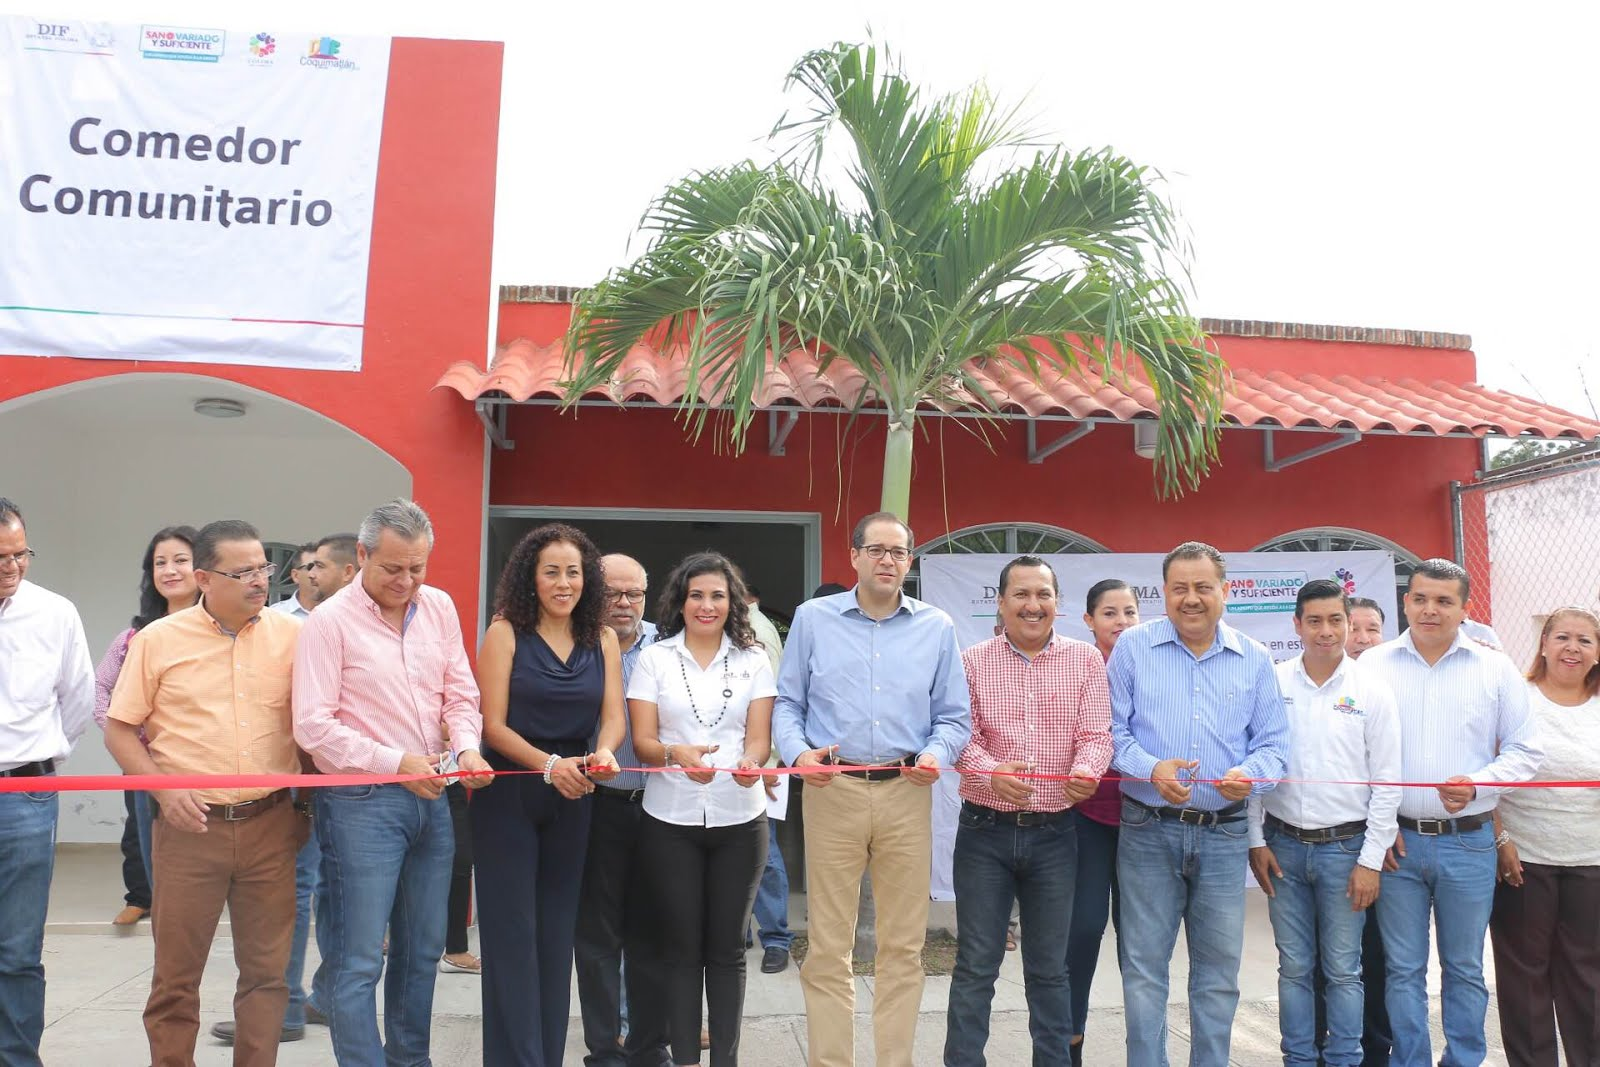 Gobcol inaugura gobernador comedor comunitario en pueblo for Proyecto social comedor comunitario